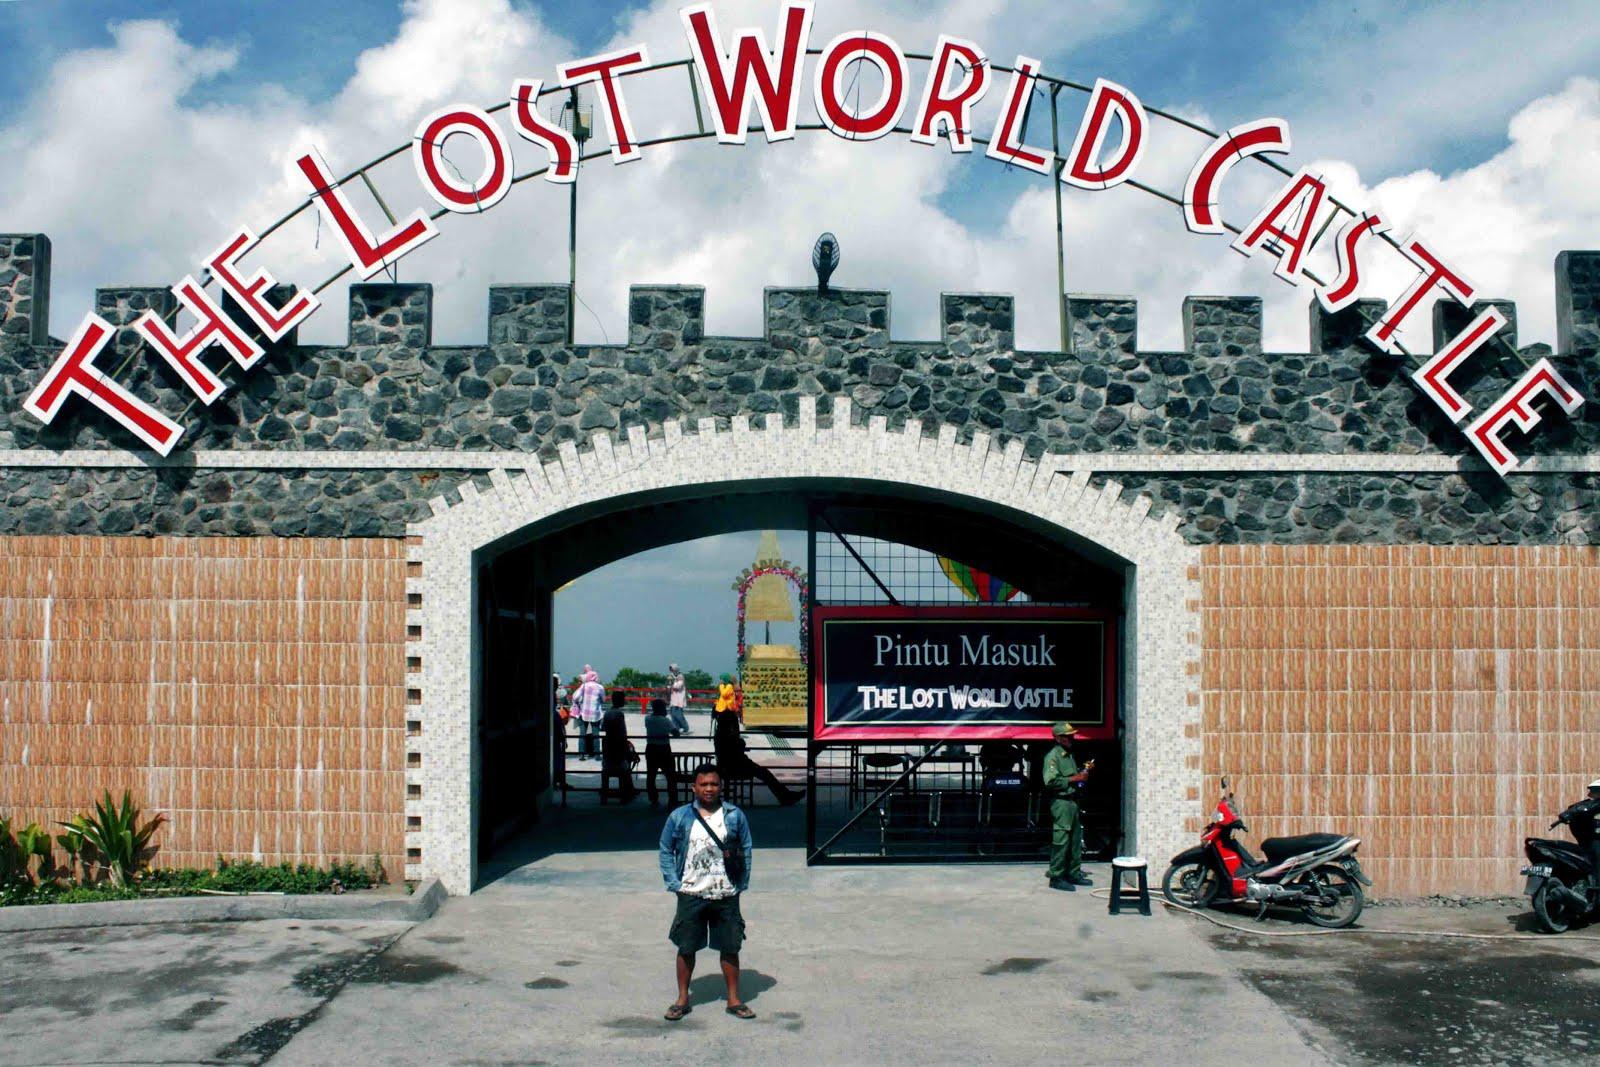 The Lost World Castle Jogja 1